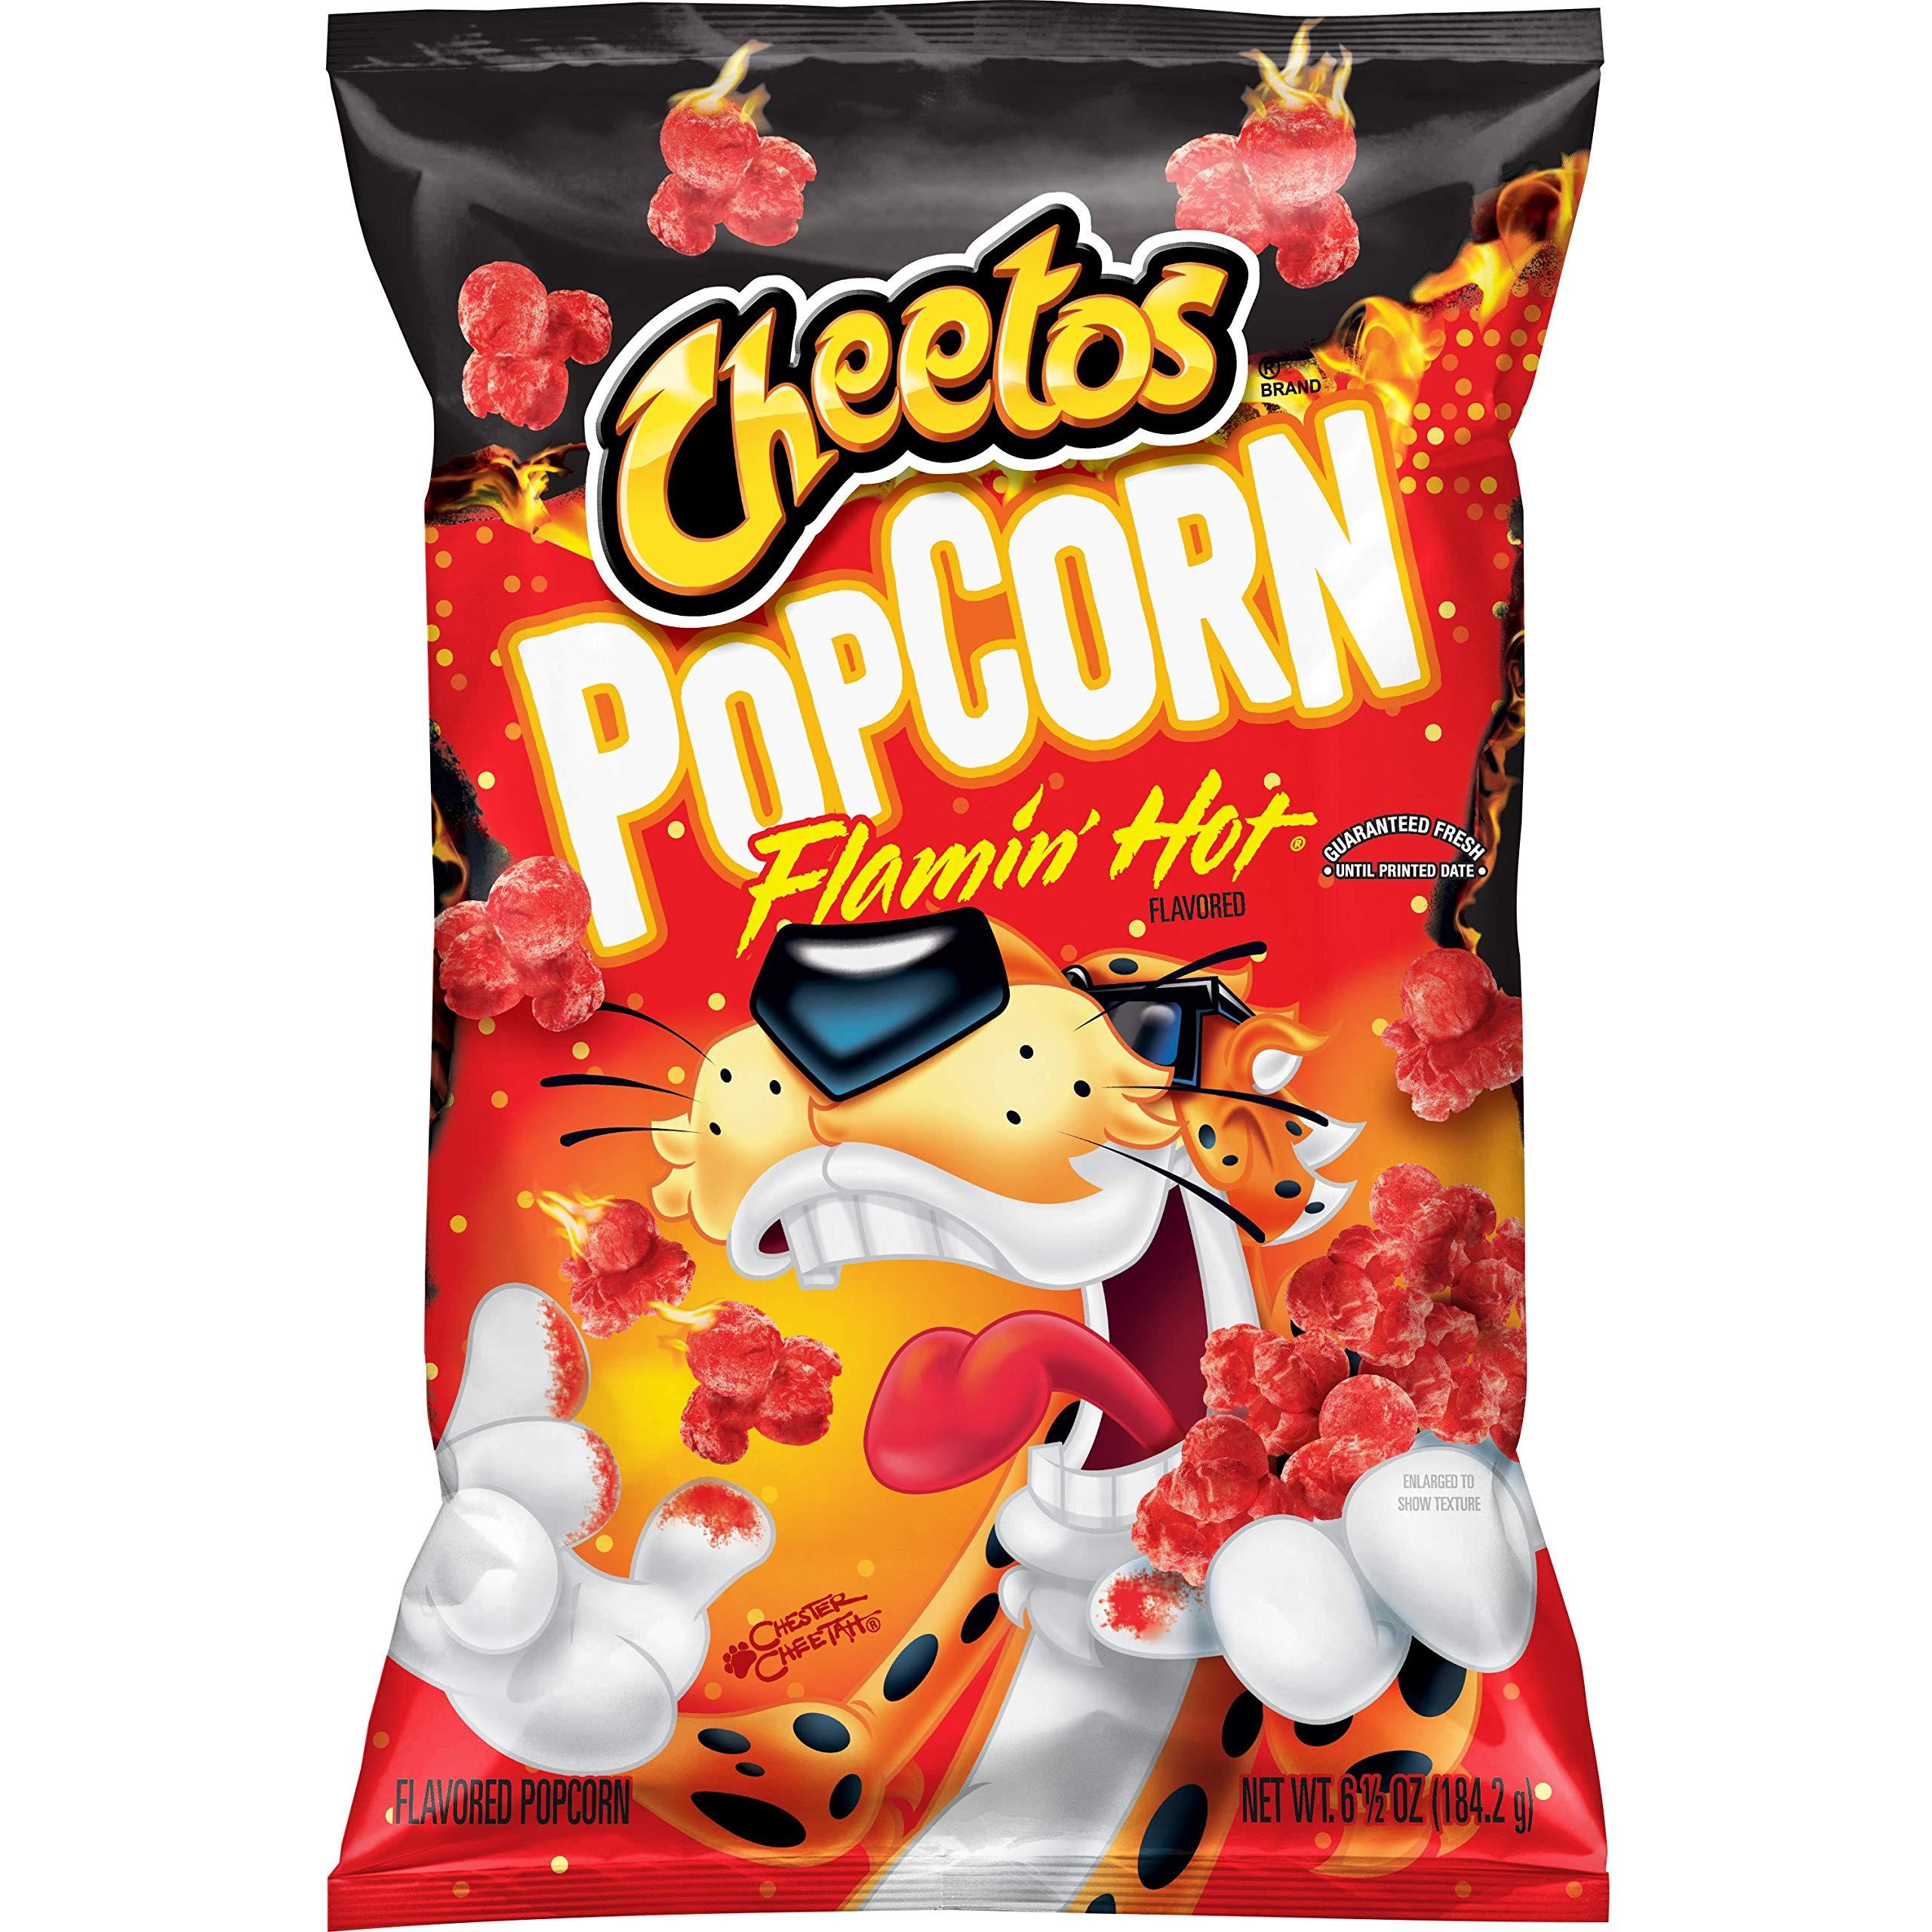 Cheetos Popcorn, Flamin' Hot, 6.5oz Bag